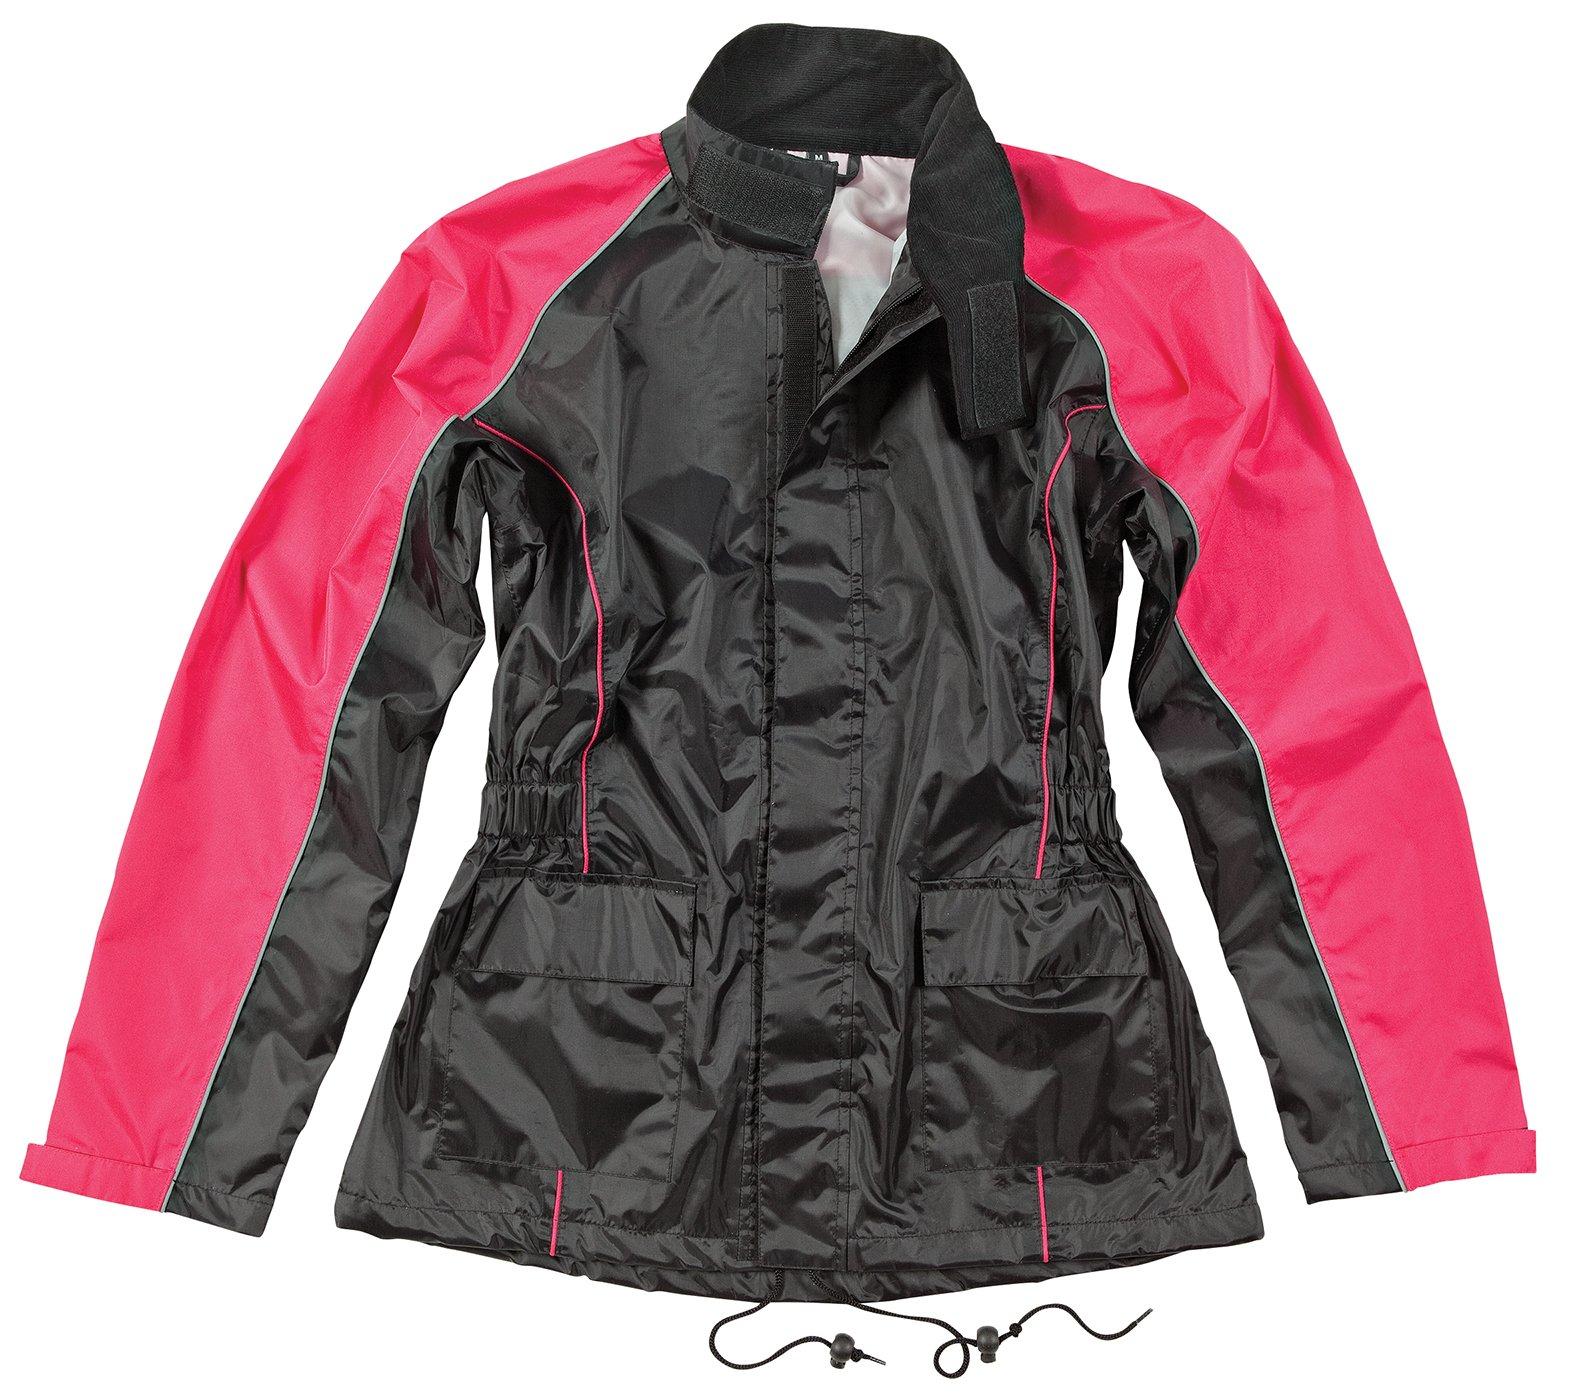 Joe Rocket RS2 Womens 2-Piece Motorcycle Rain Suit (Black/Pink, X-Large)